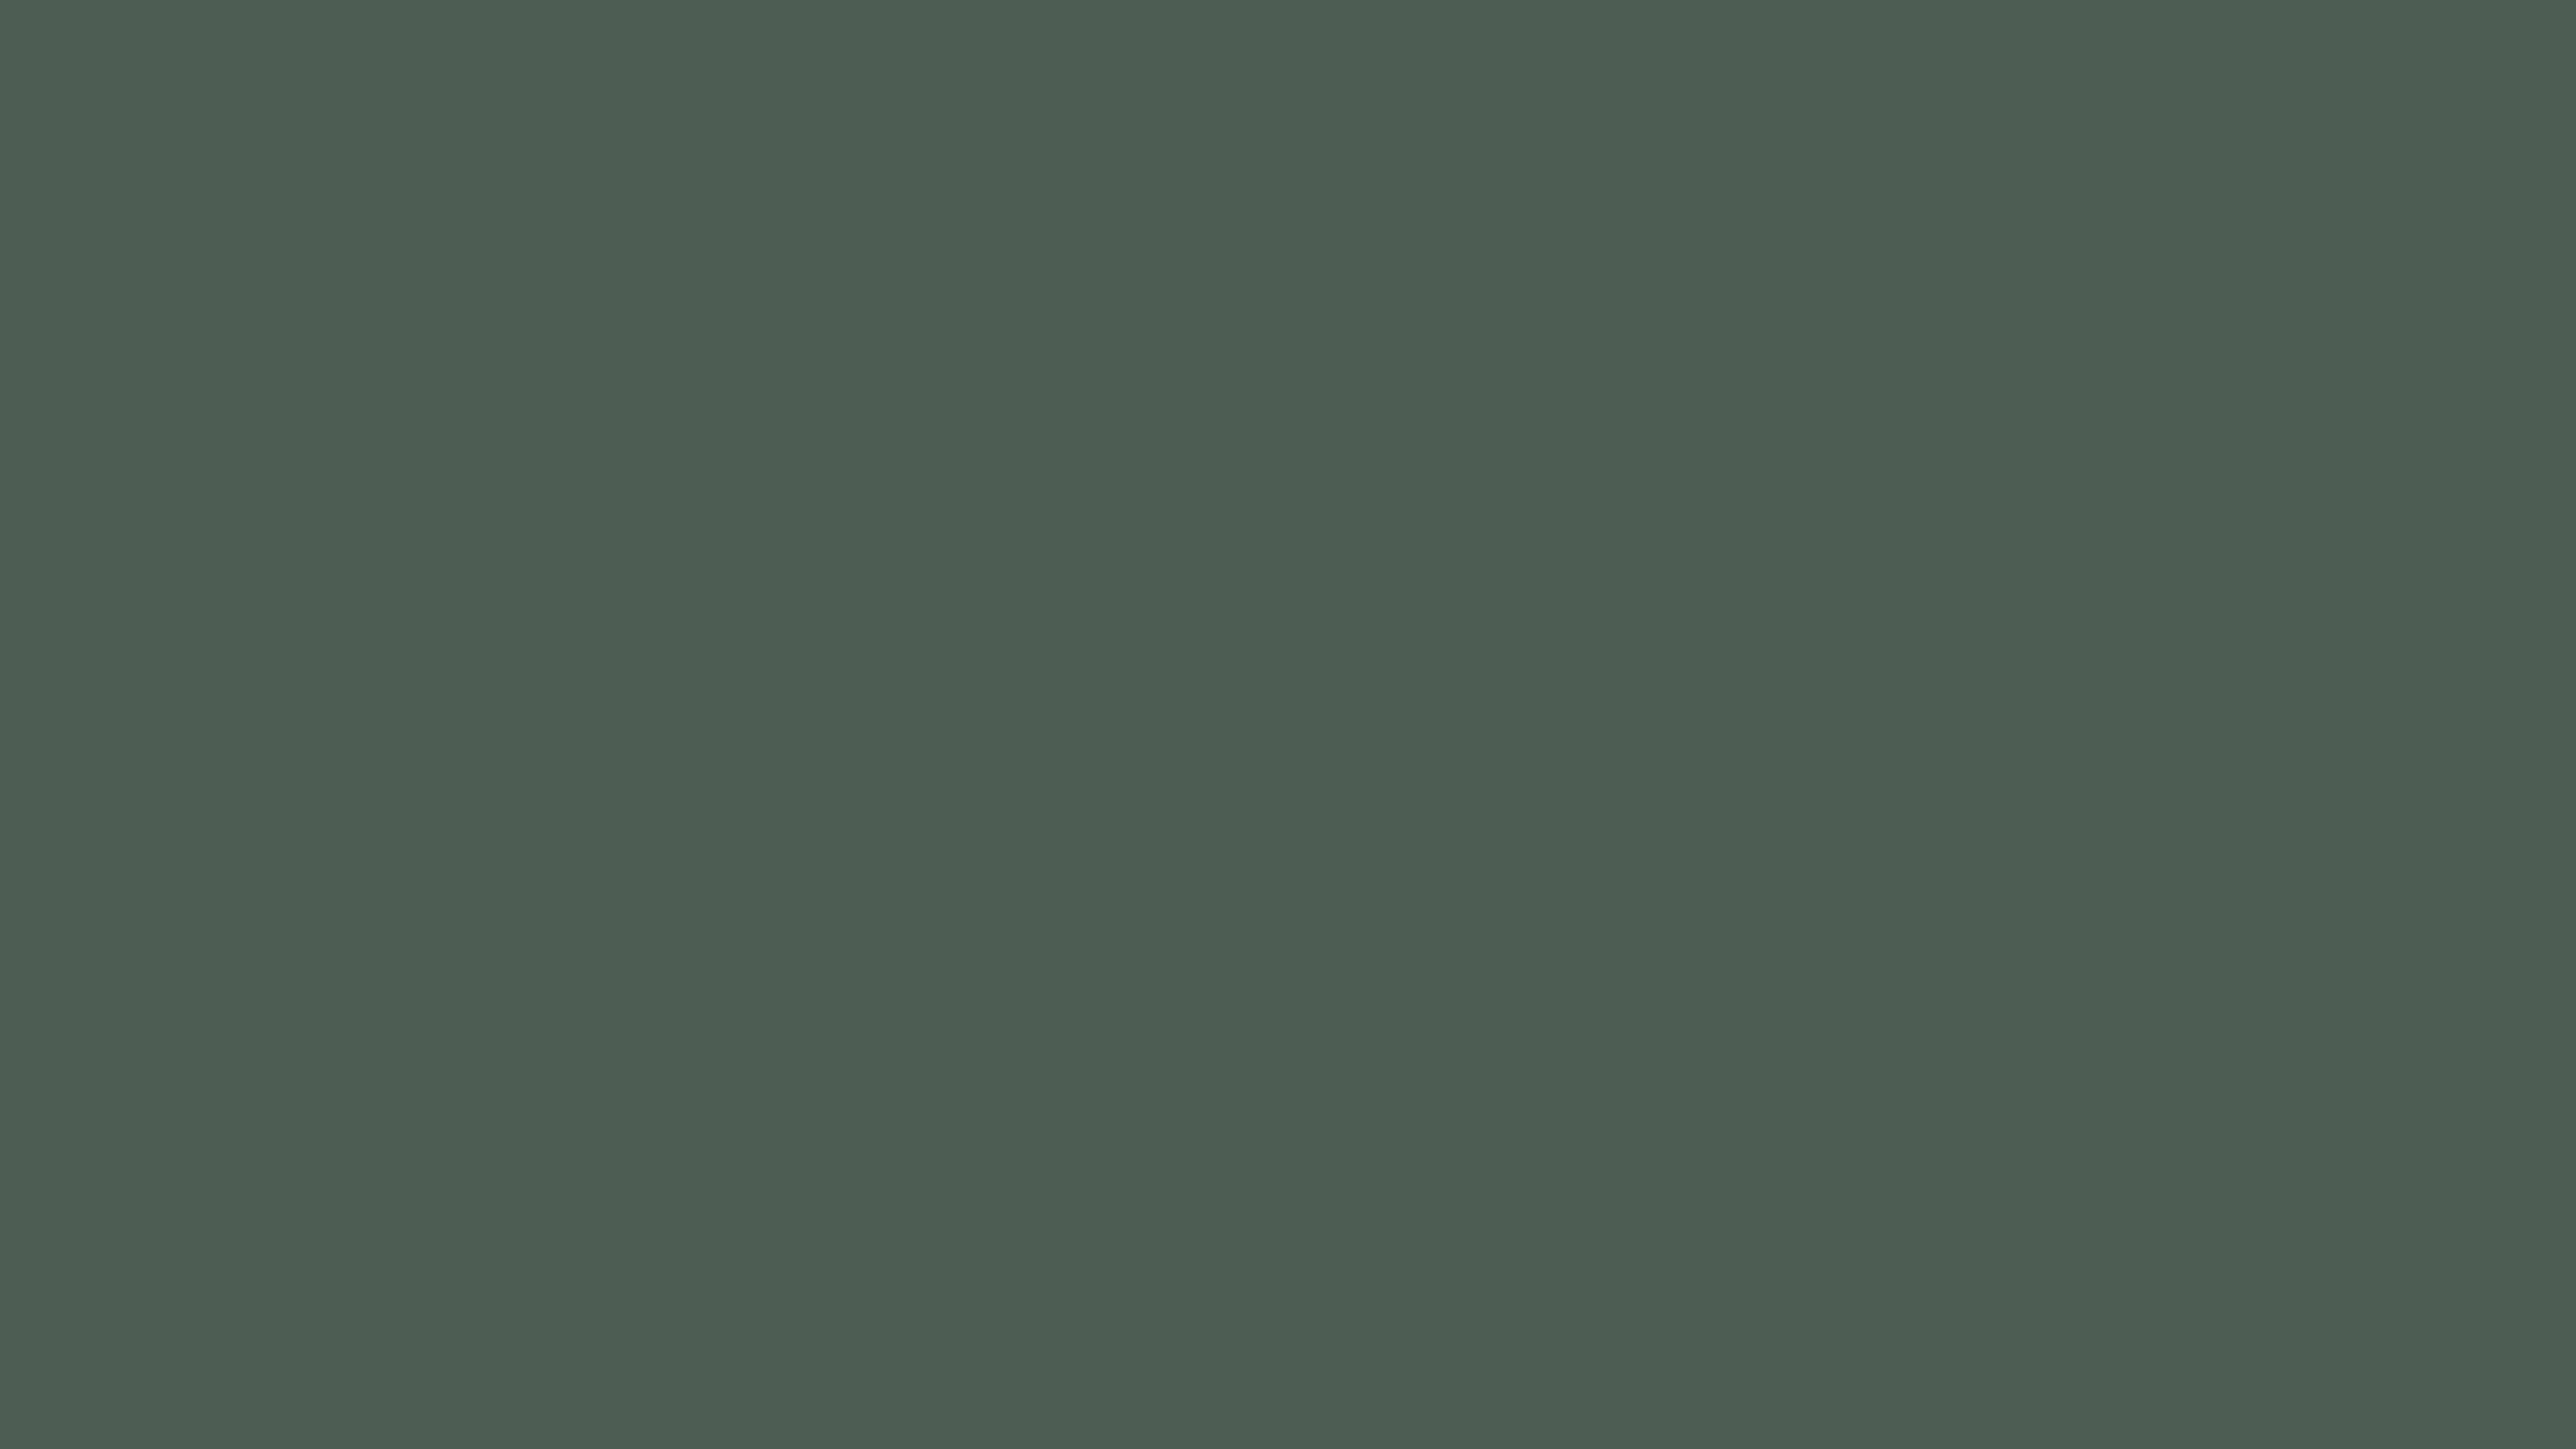 3840x2160 Feldgrau Solid Color Background